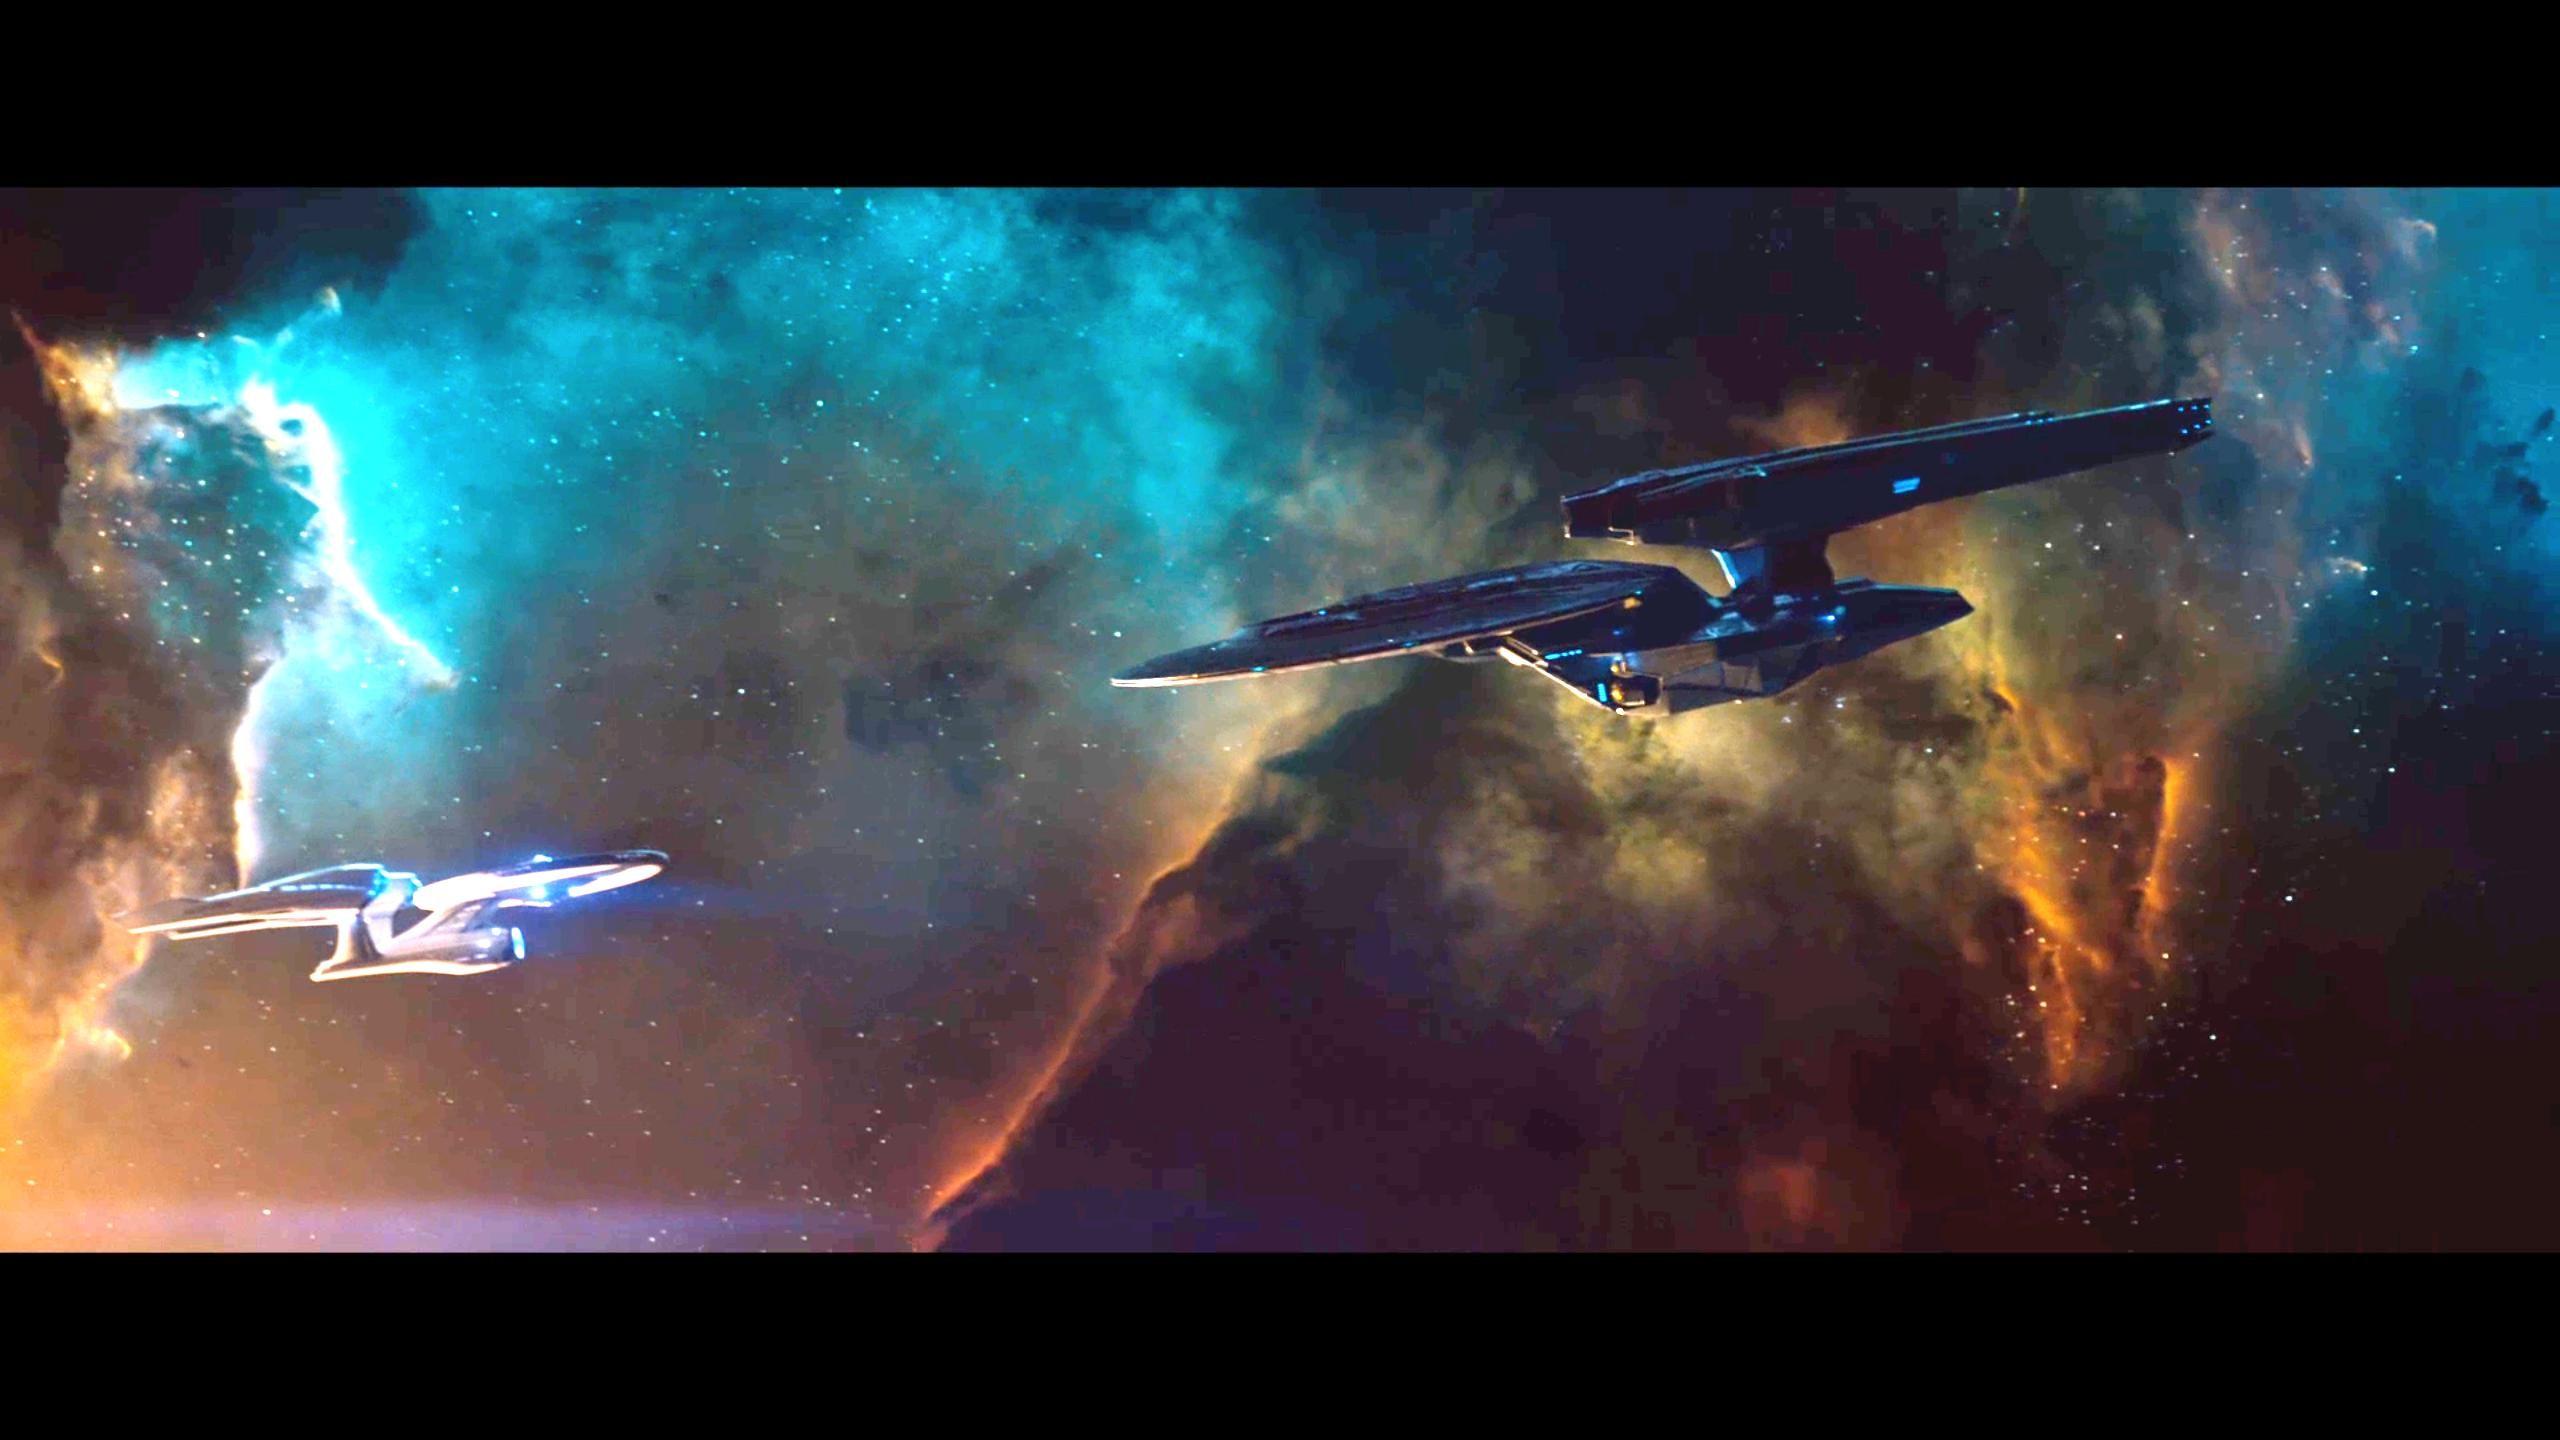 Star Trek Wallpapers